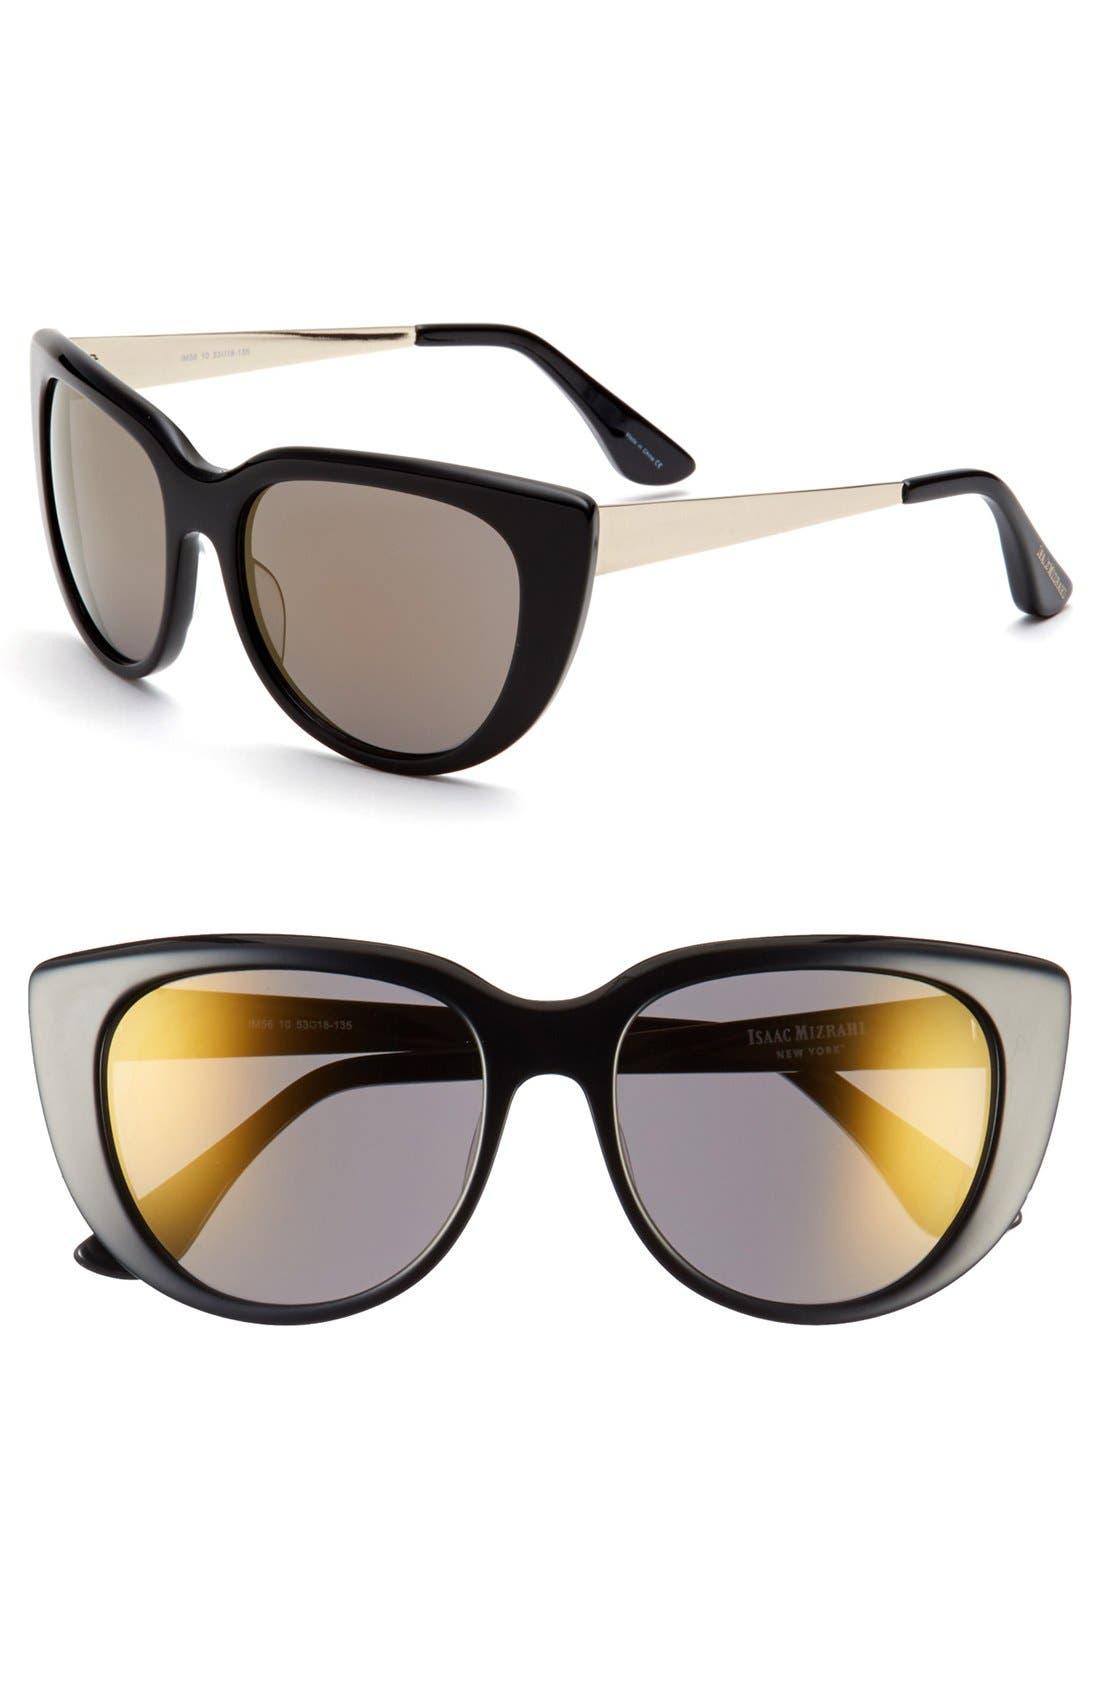 Main Image - Isaac Mizrahi New York 53mm Sunglasses